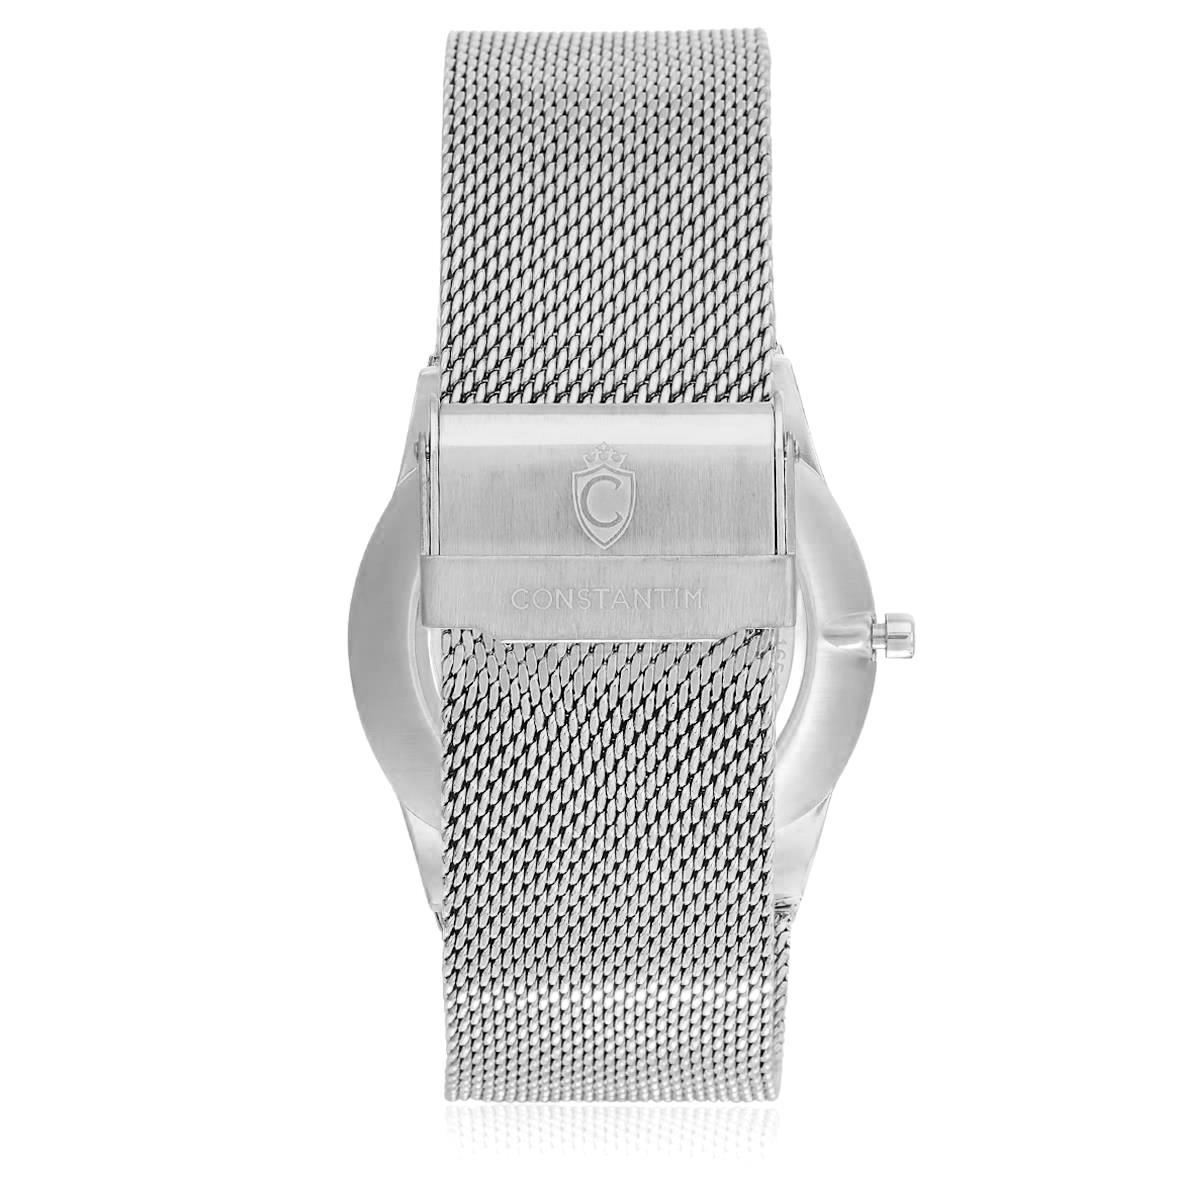 0c5fdec7c4d Relógio Masculino Constantim Odense Analógico ZW20010U-S Silver Black